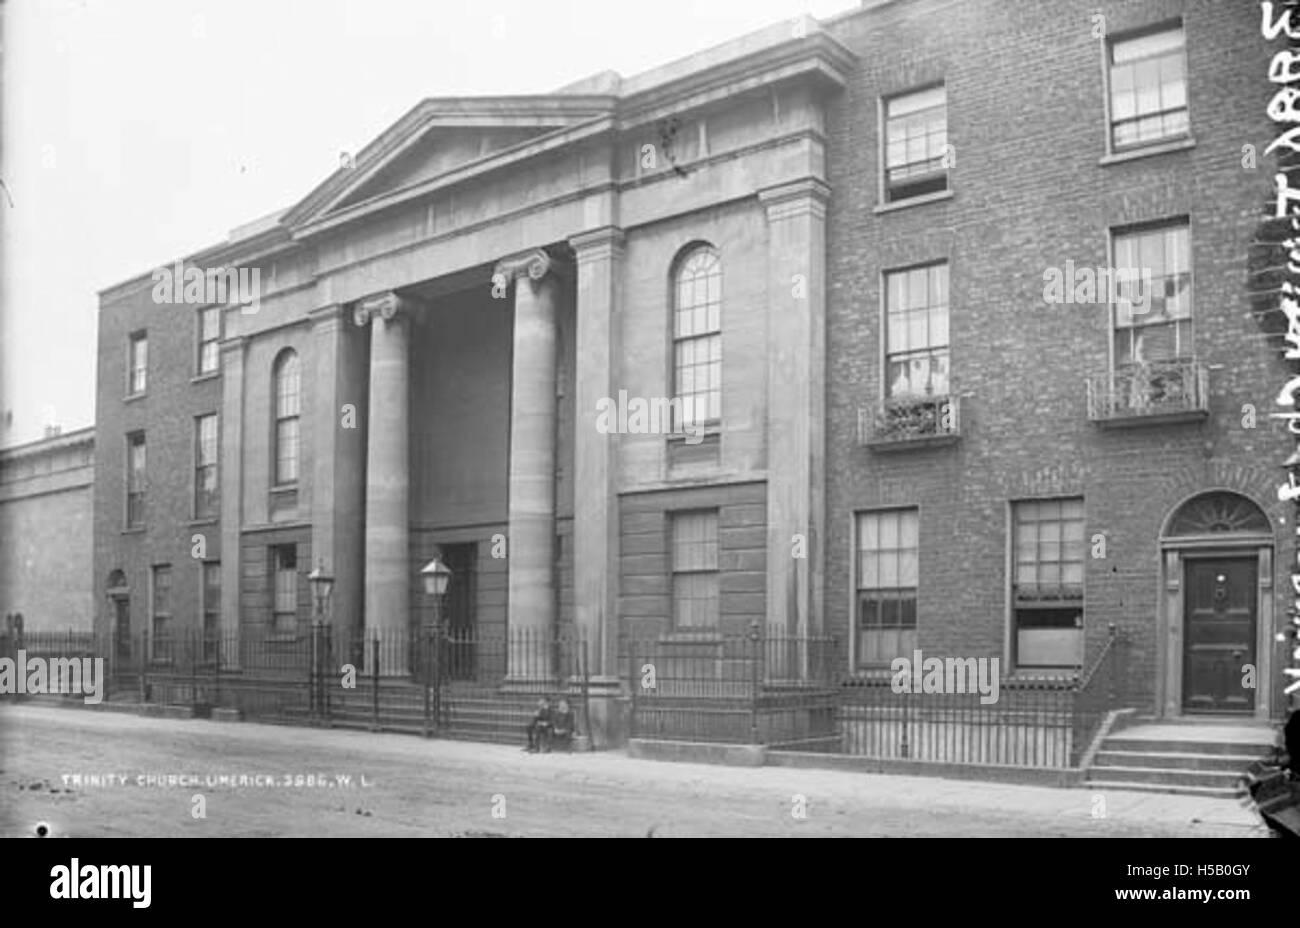 Trinity Church, Limerick - Stock Image